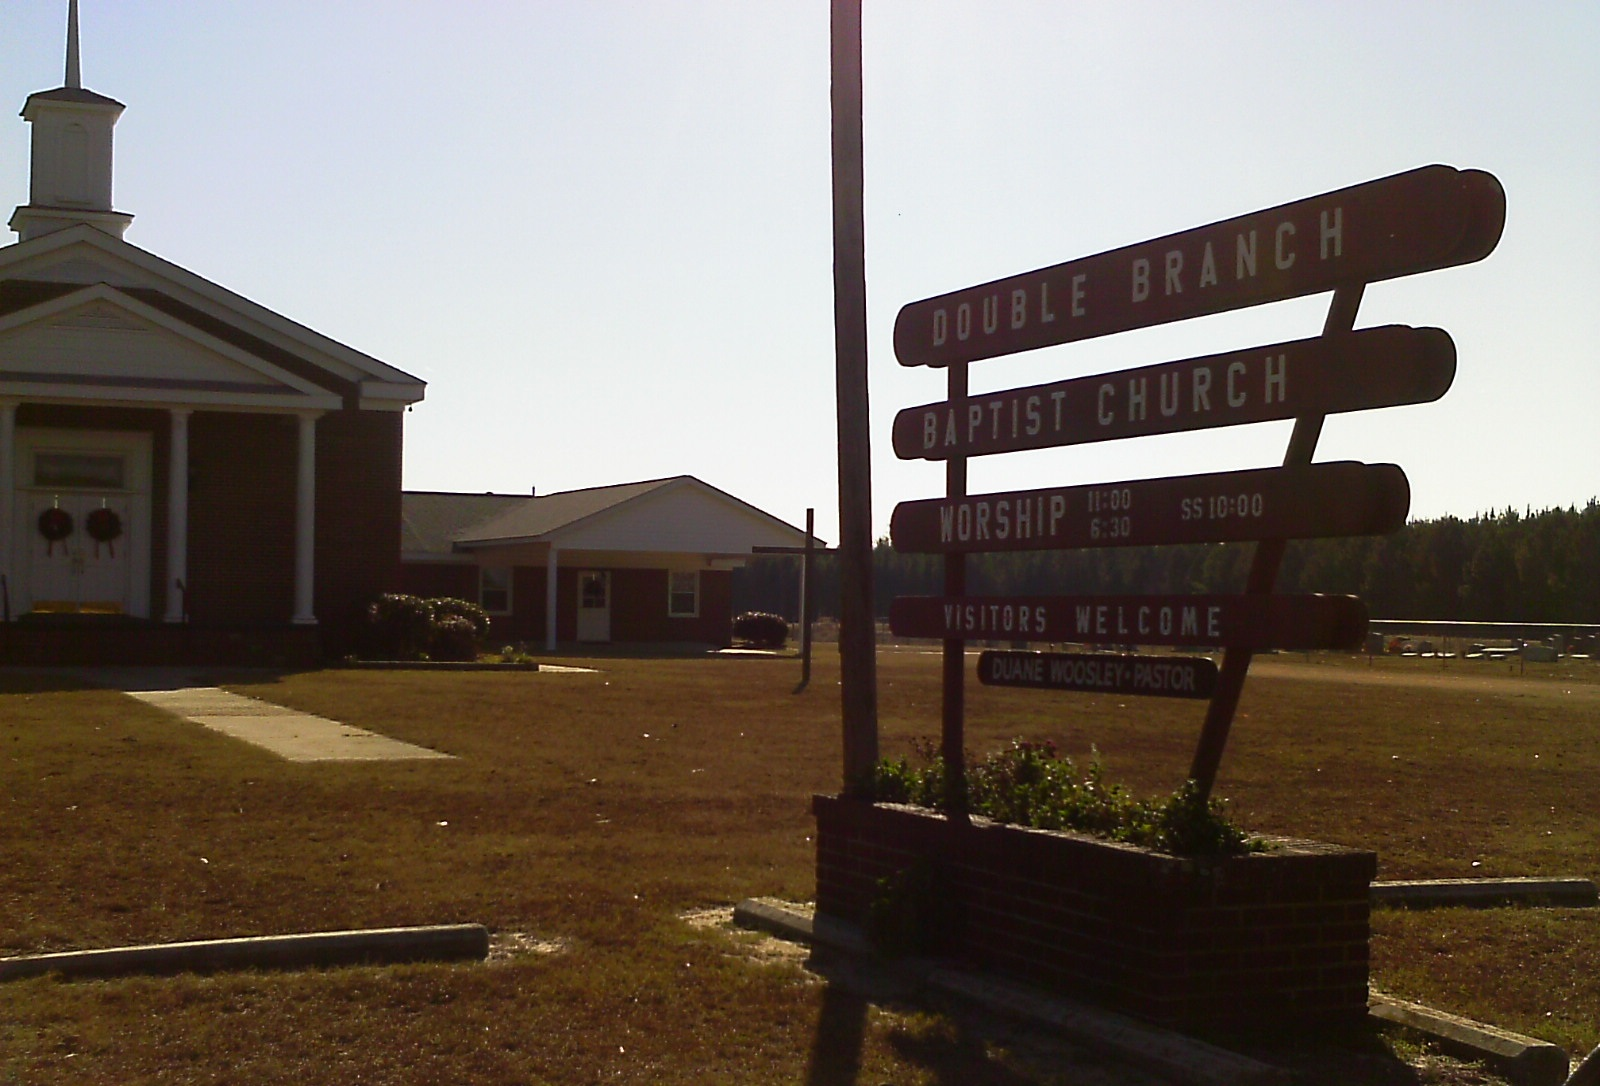 Double Branch Baptist Church Cemetery